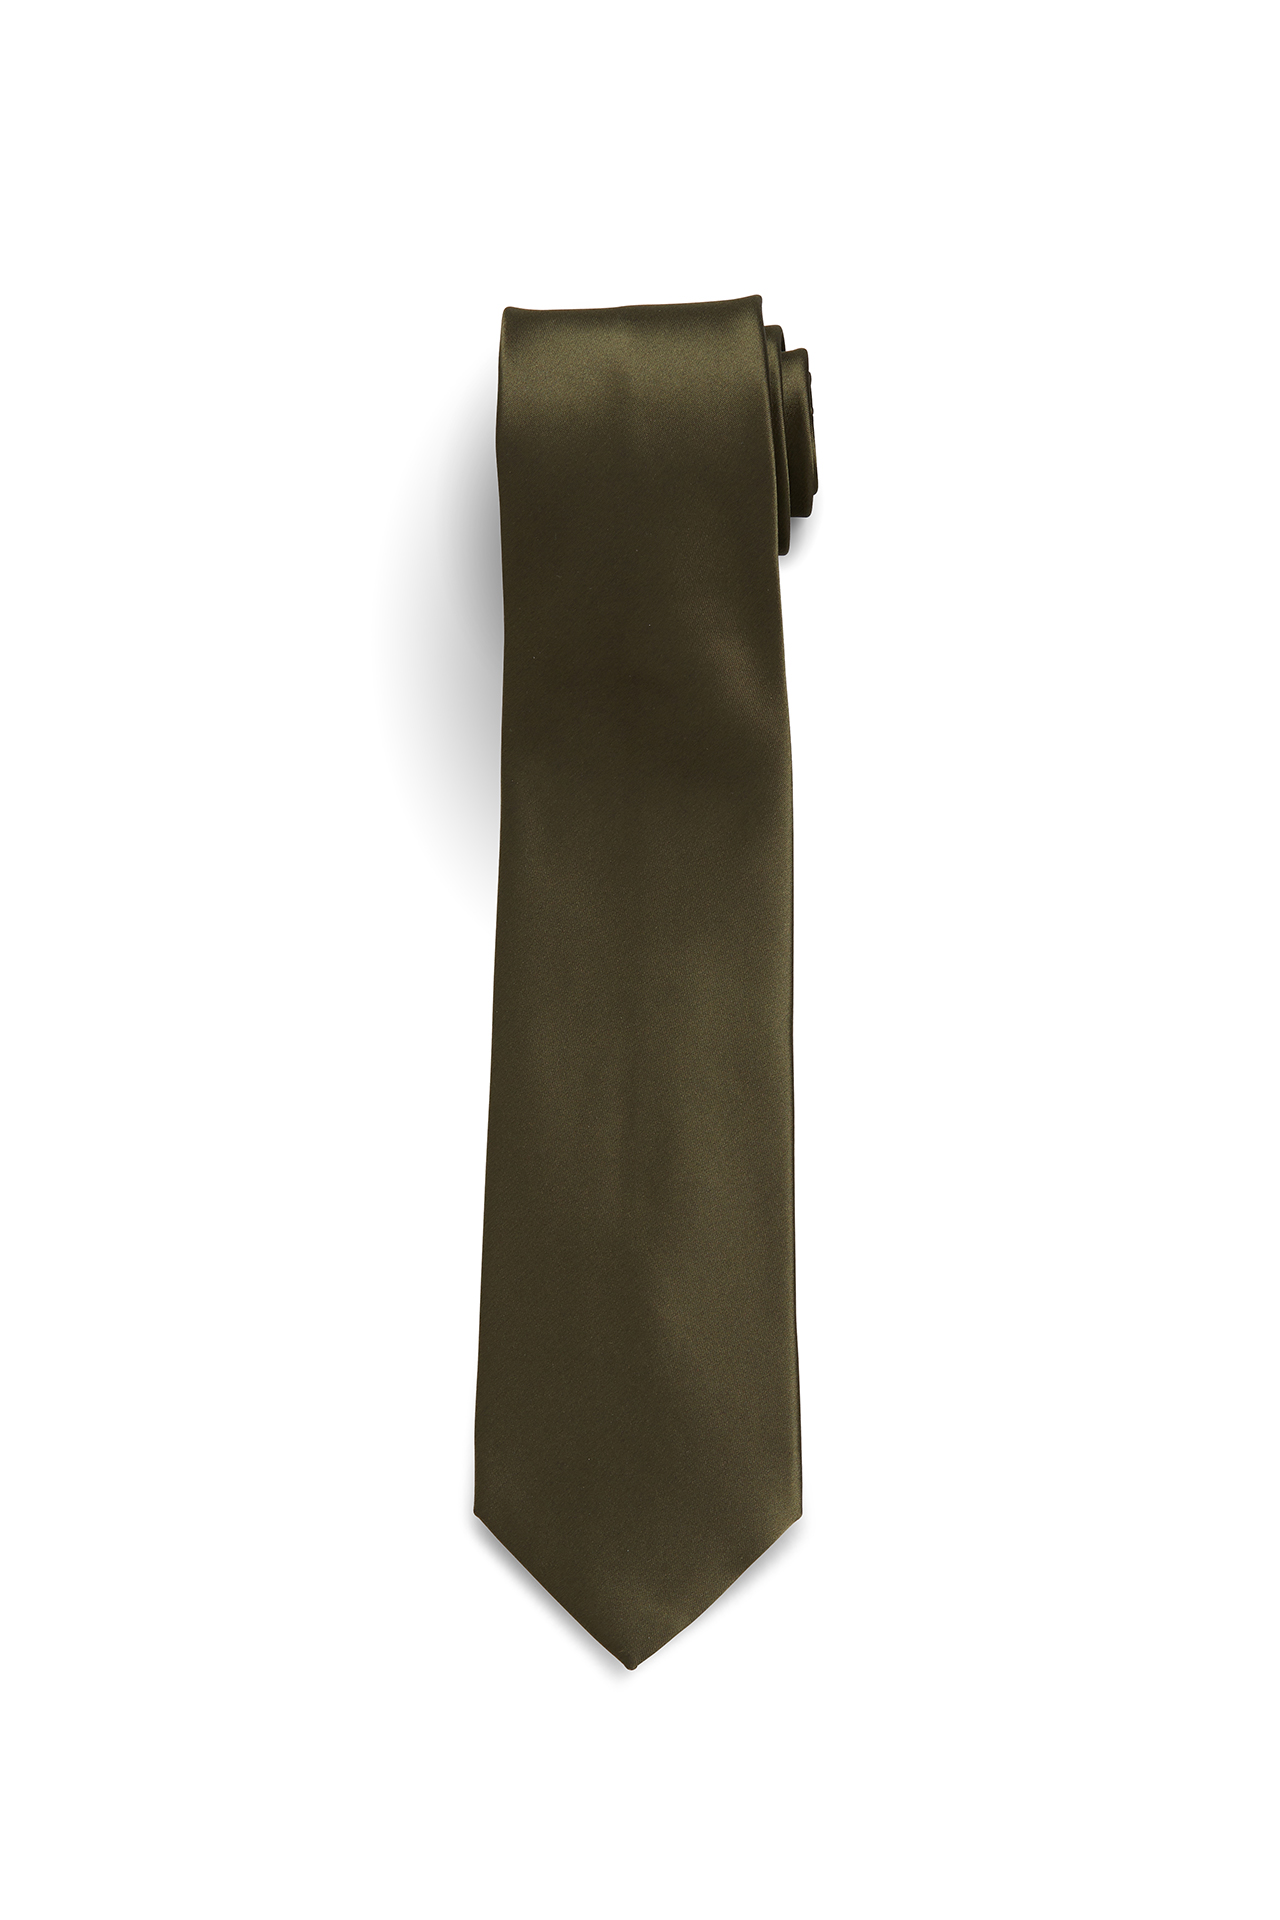 Solid Silk-Satin Olive Green Tie